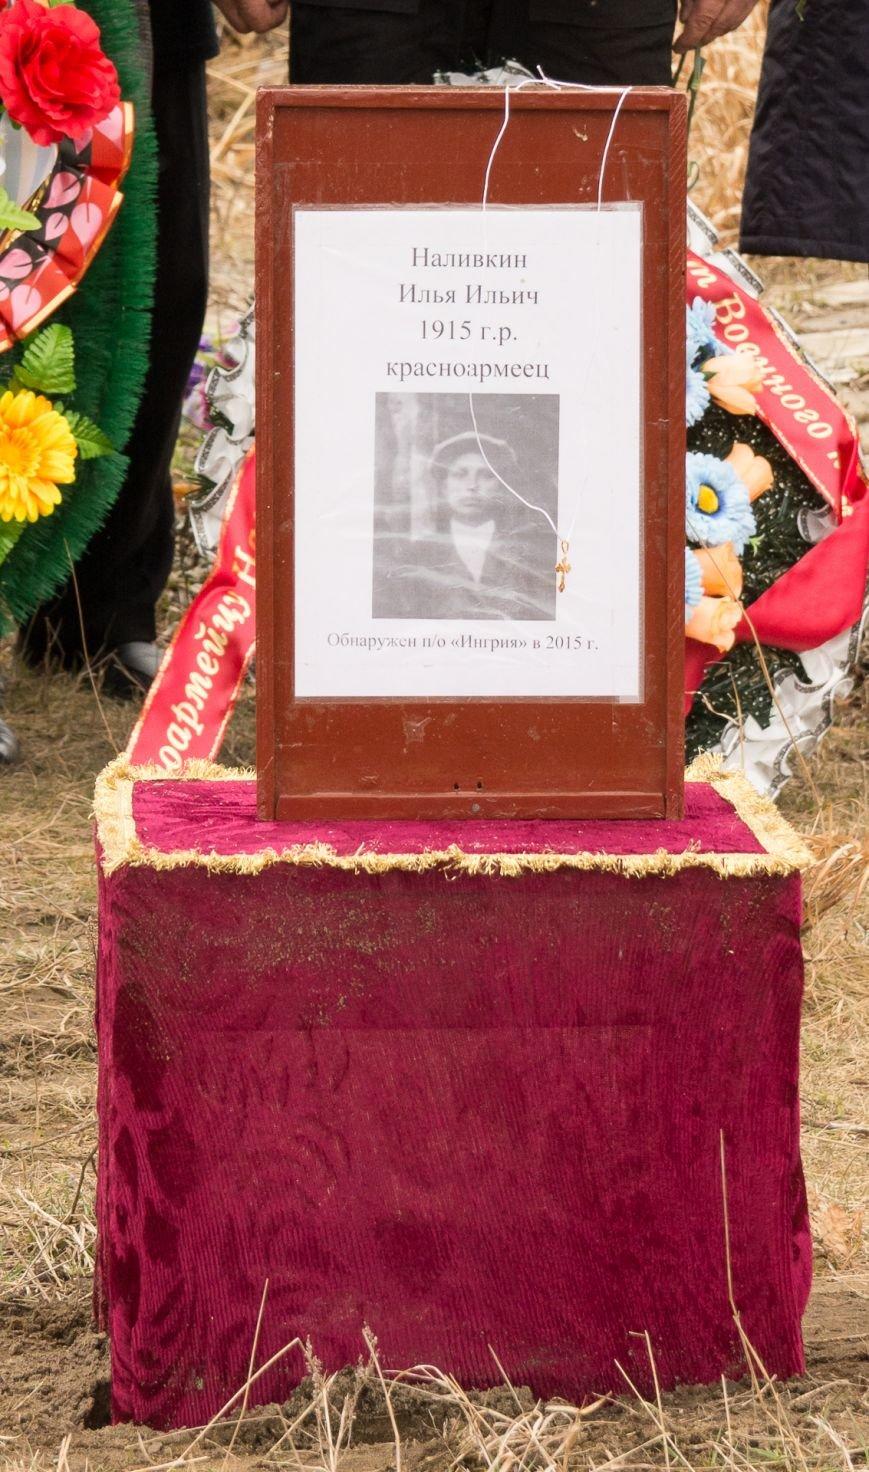 Останки защитника Ленинграда захоронили в сахалинском Холмске, фото-2